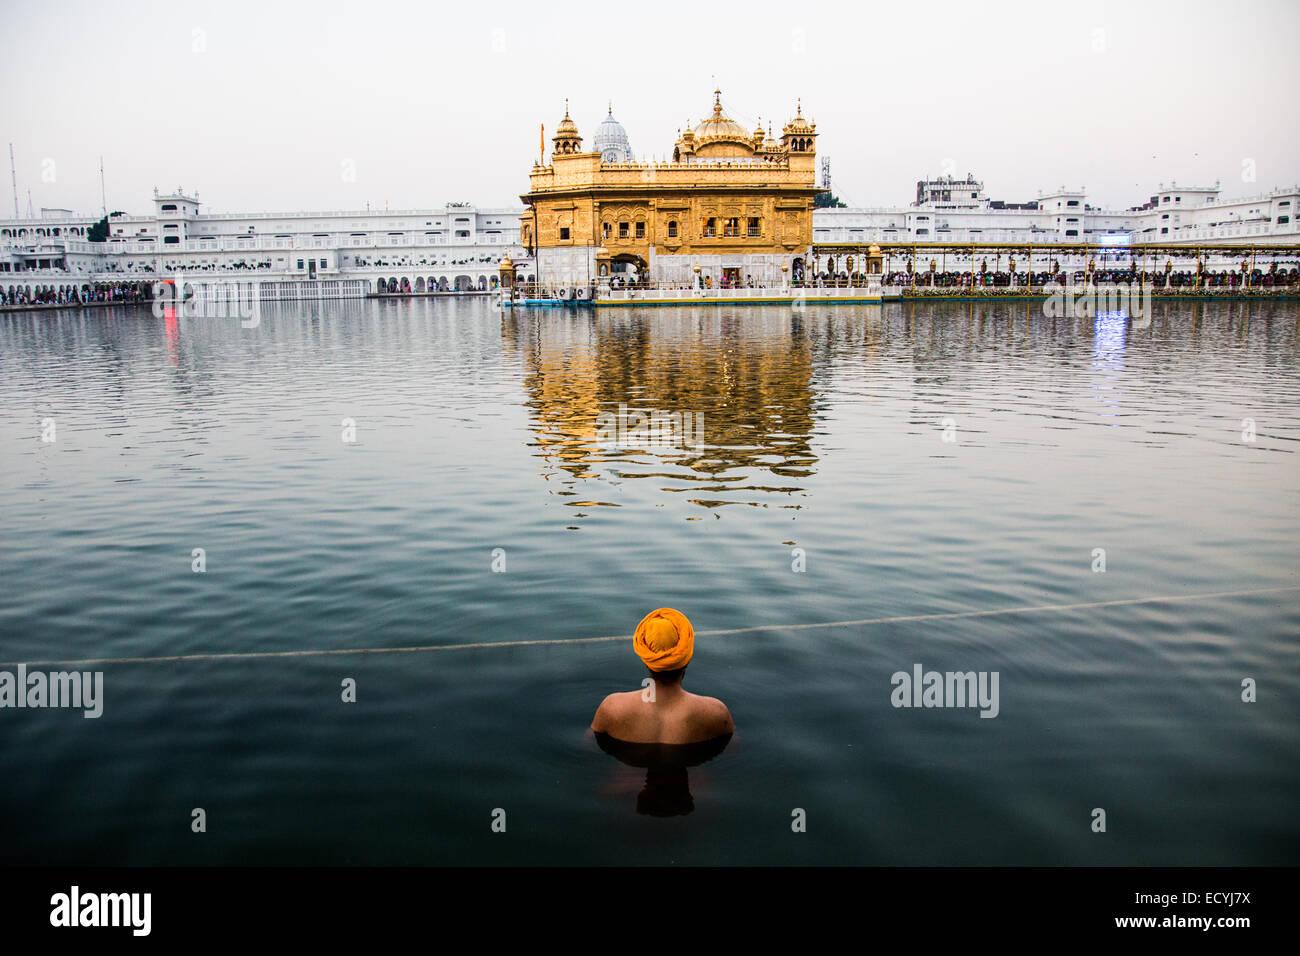 Golden Temple or Harmandir Sahib Sikh Temple in Amritsar, India Stock Photo